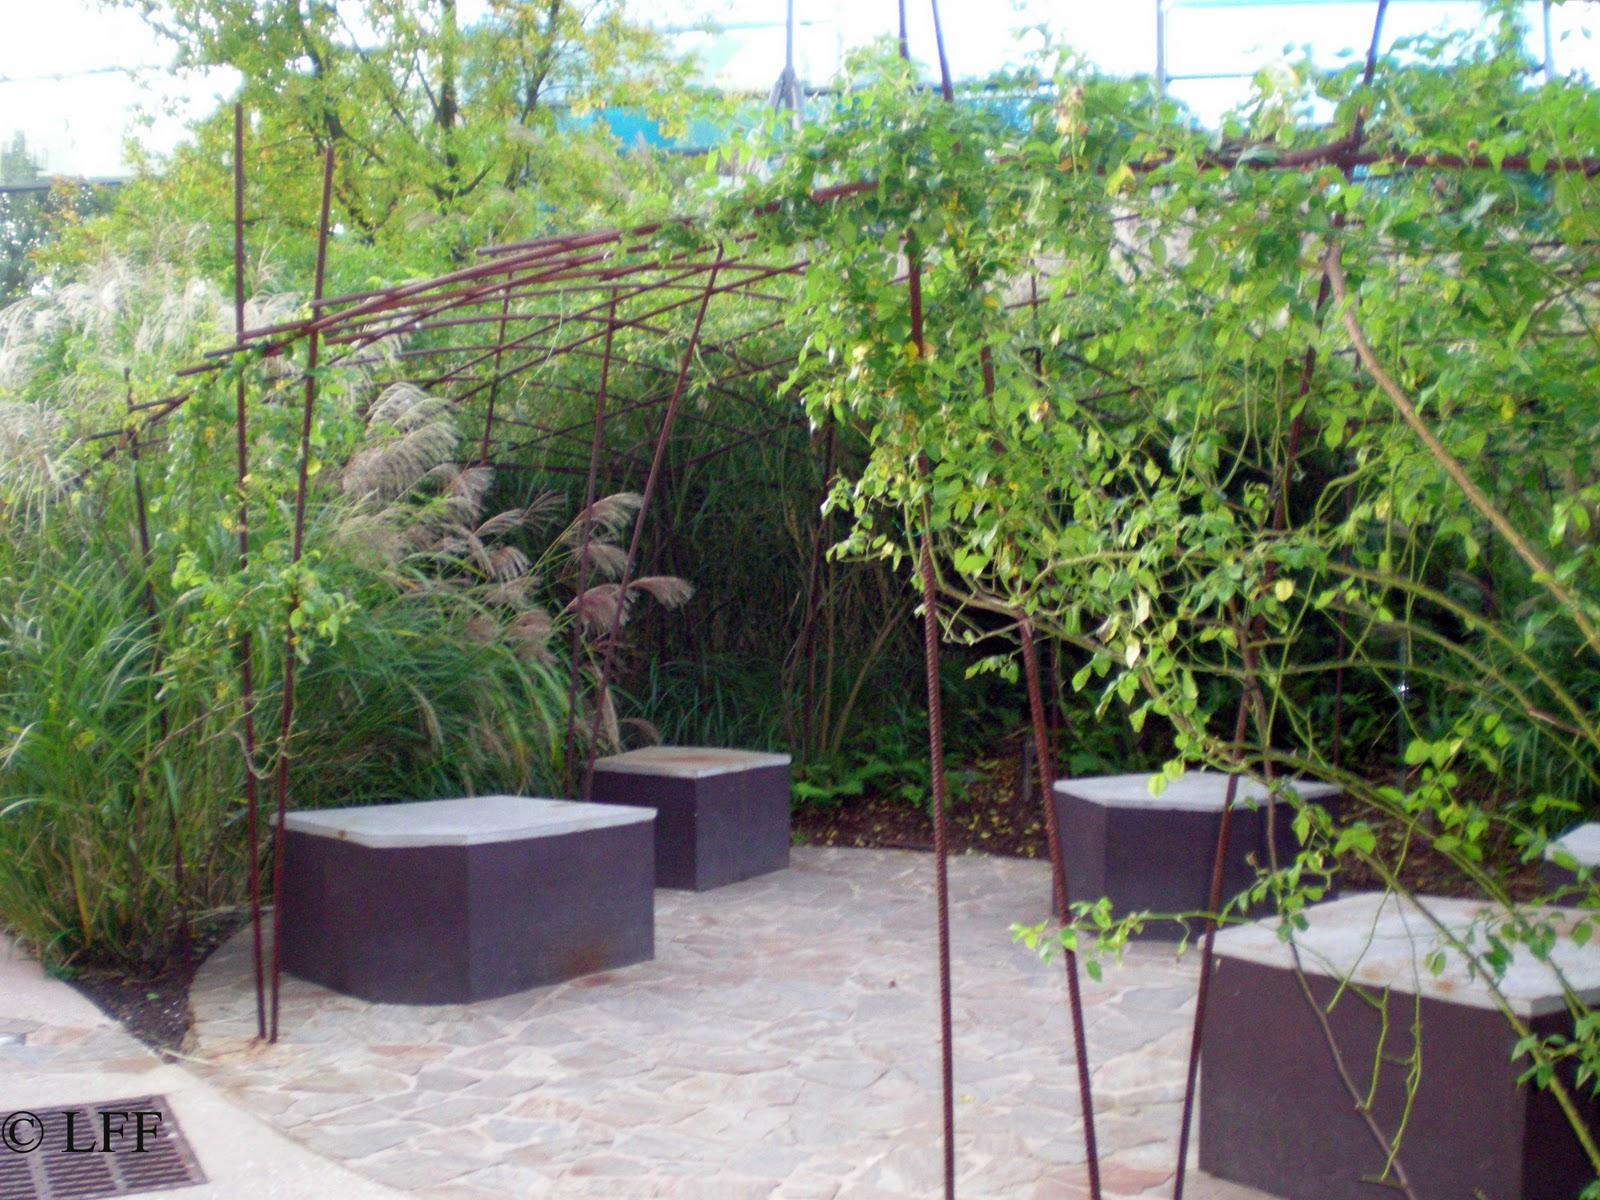 Pensando jardines jard n del museo quai branly for Jardin quai branly